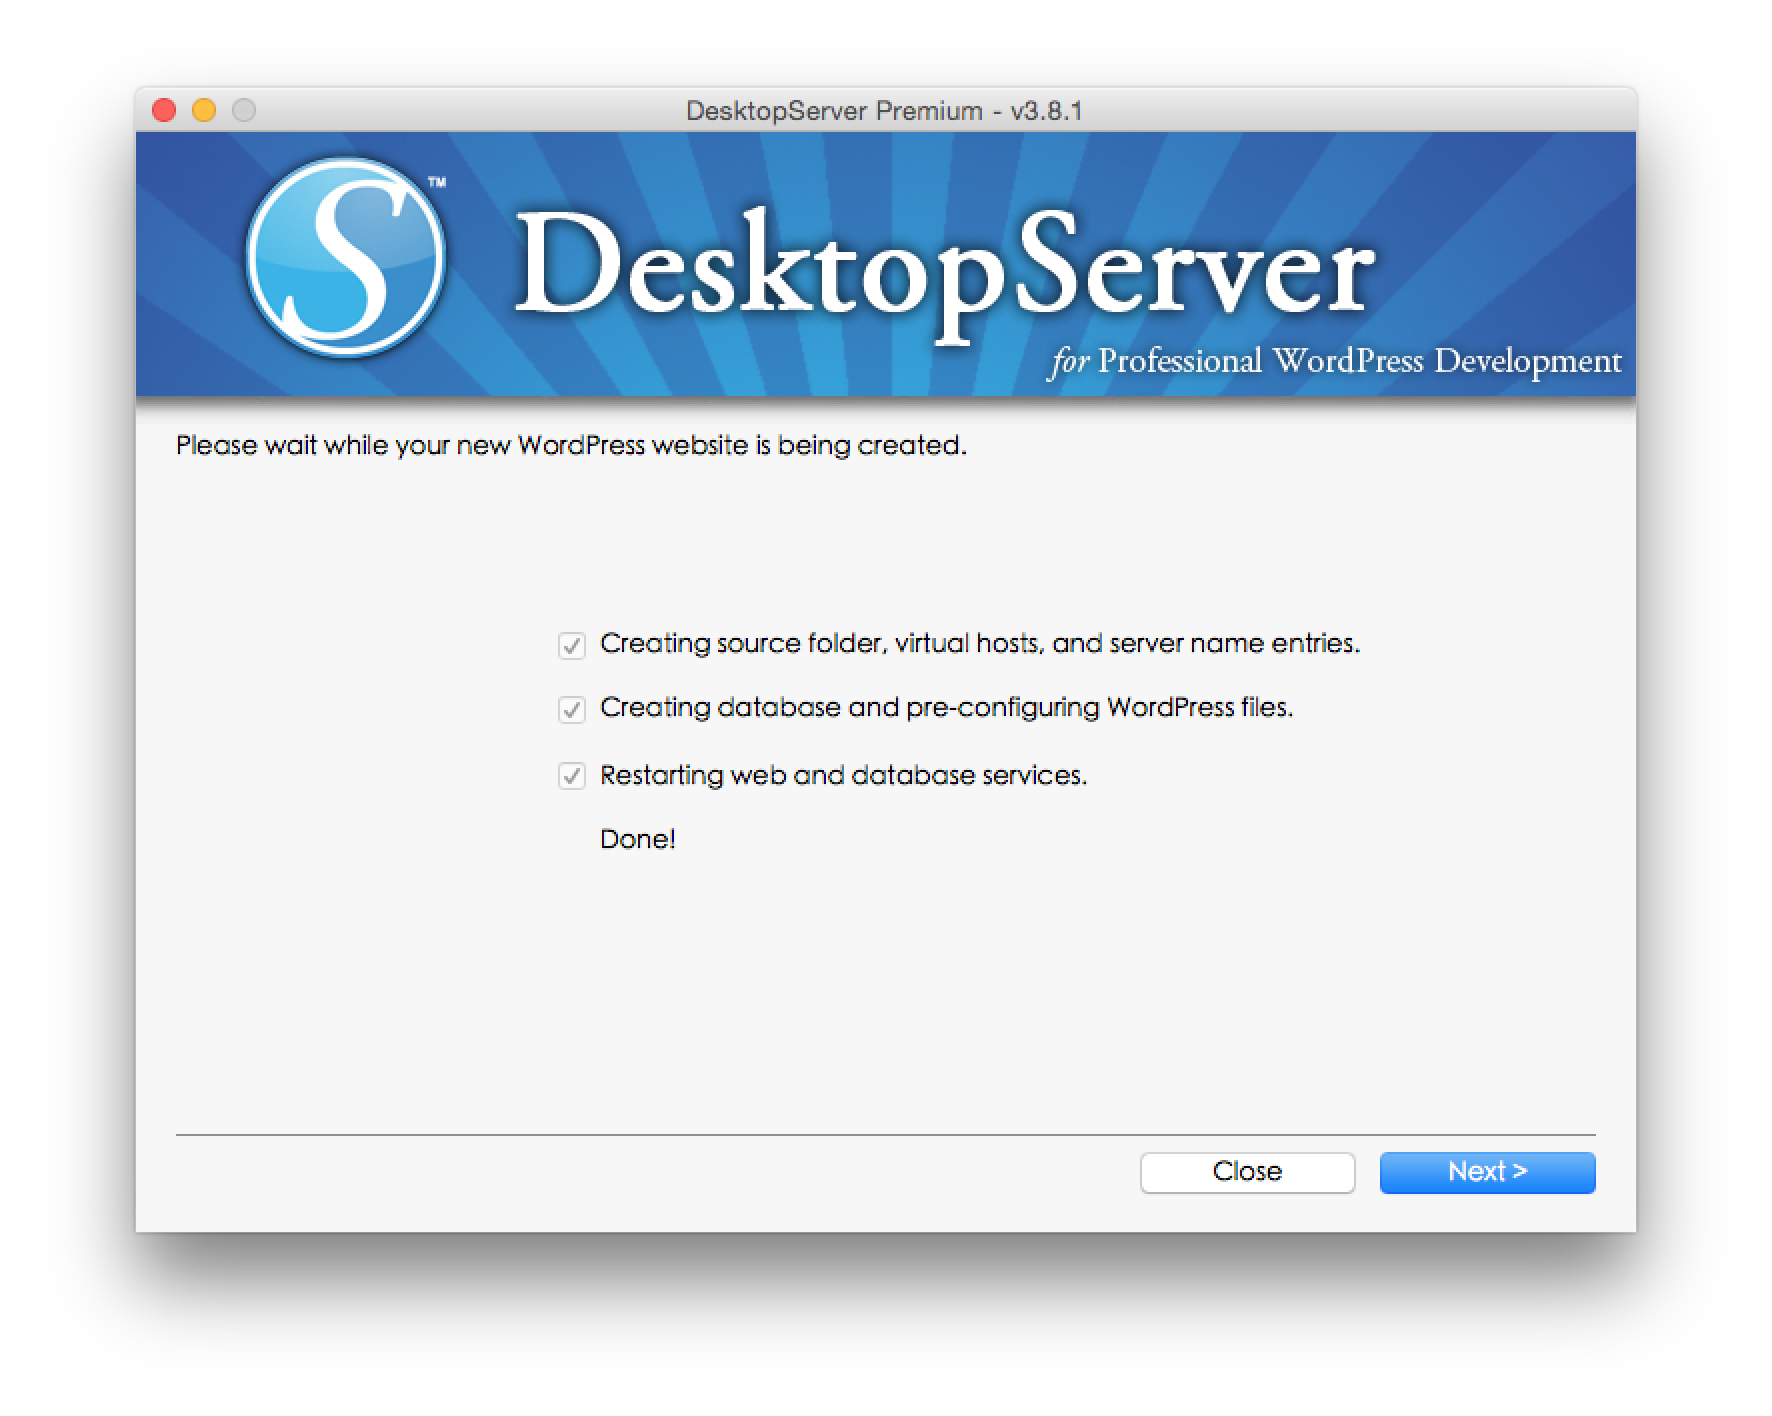 desktopserver_4